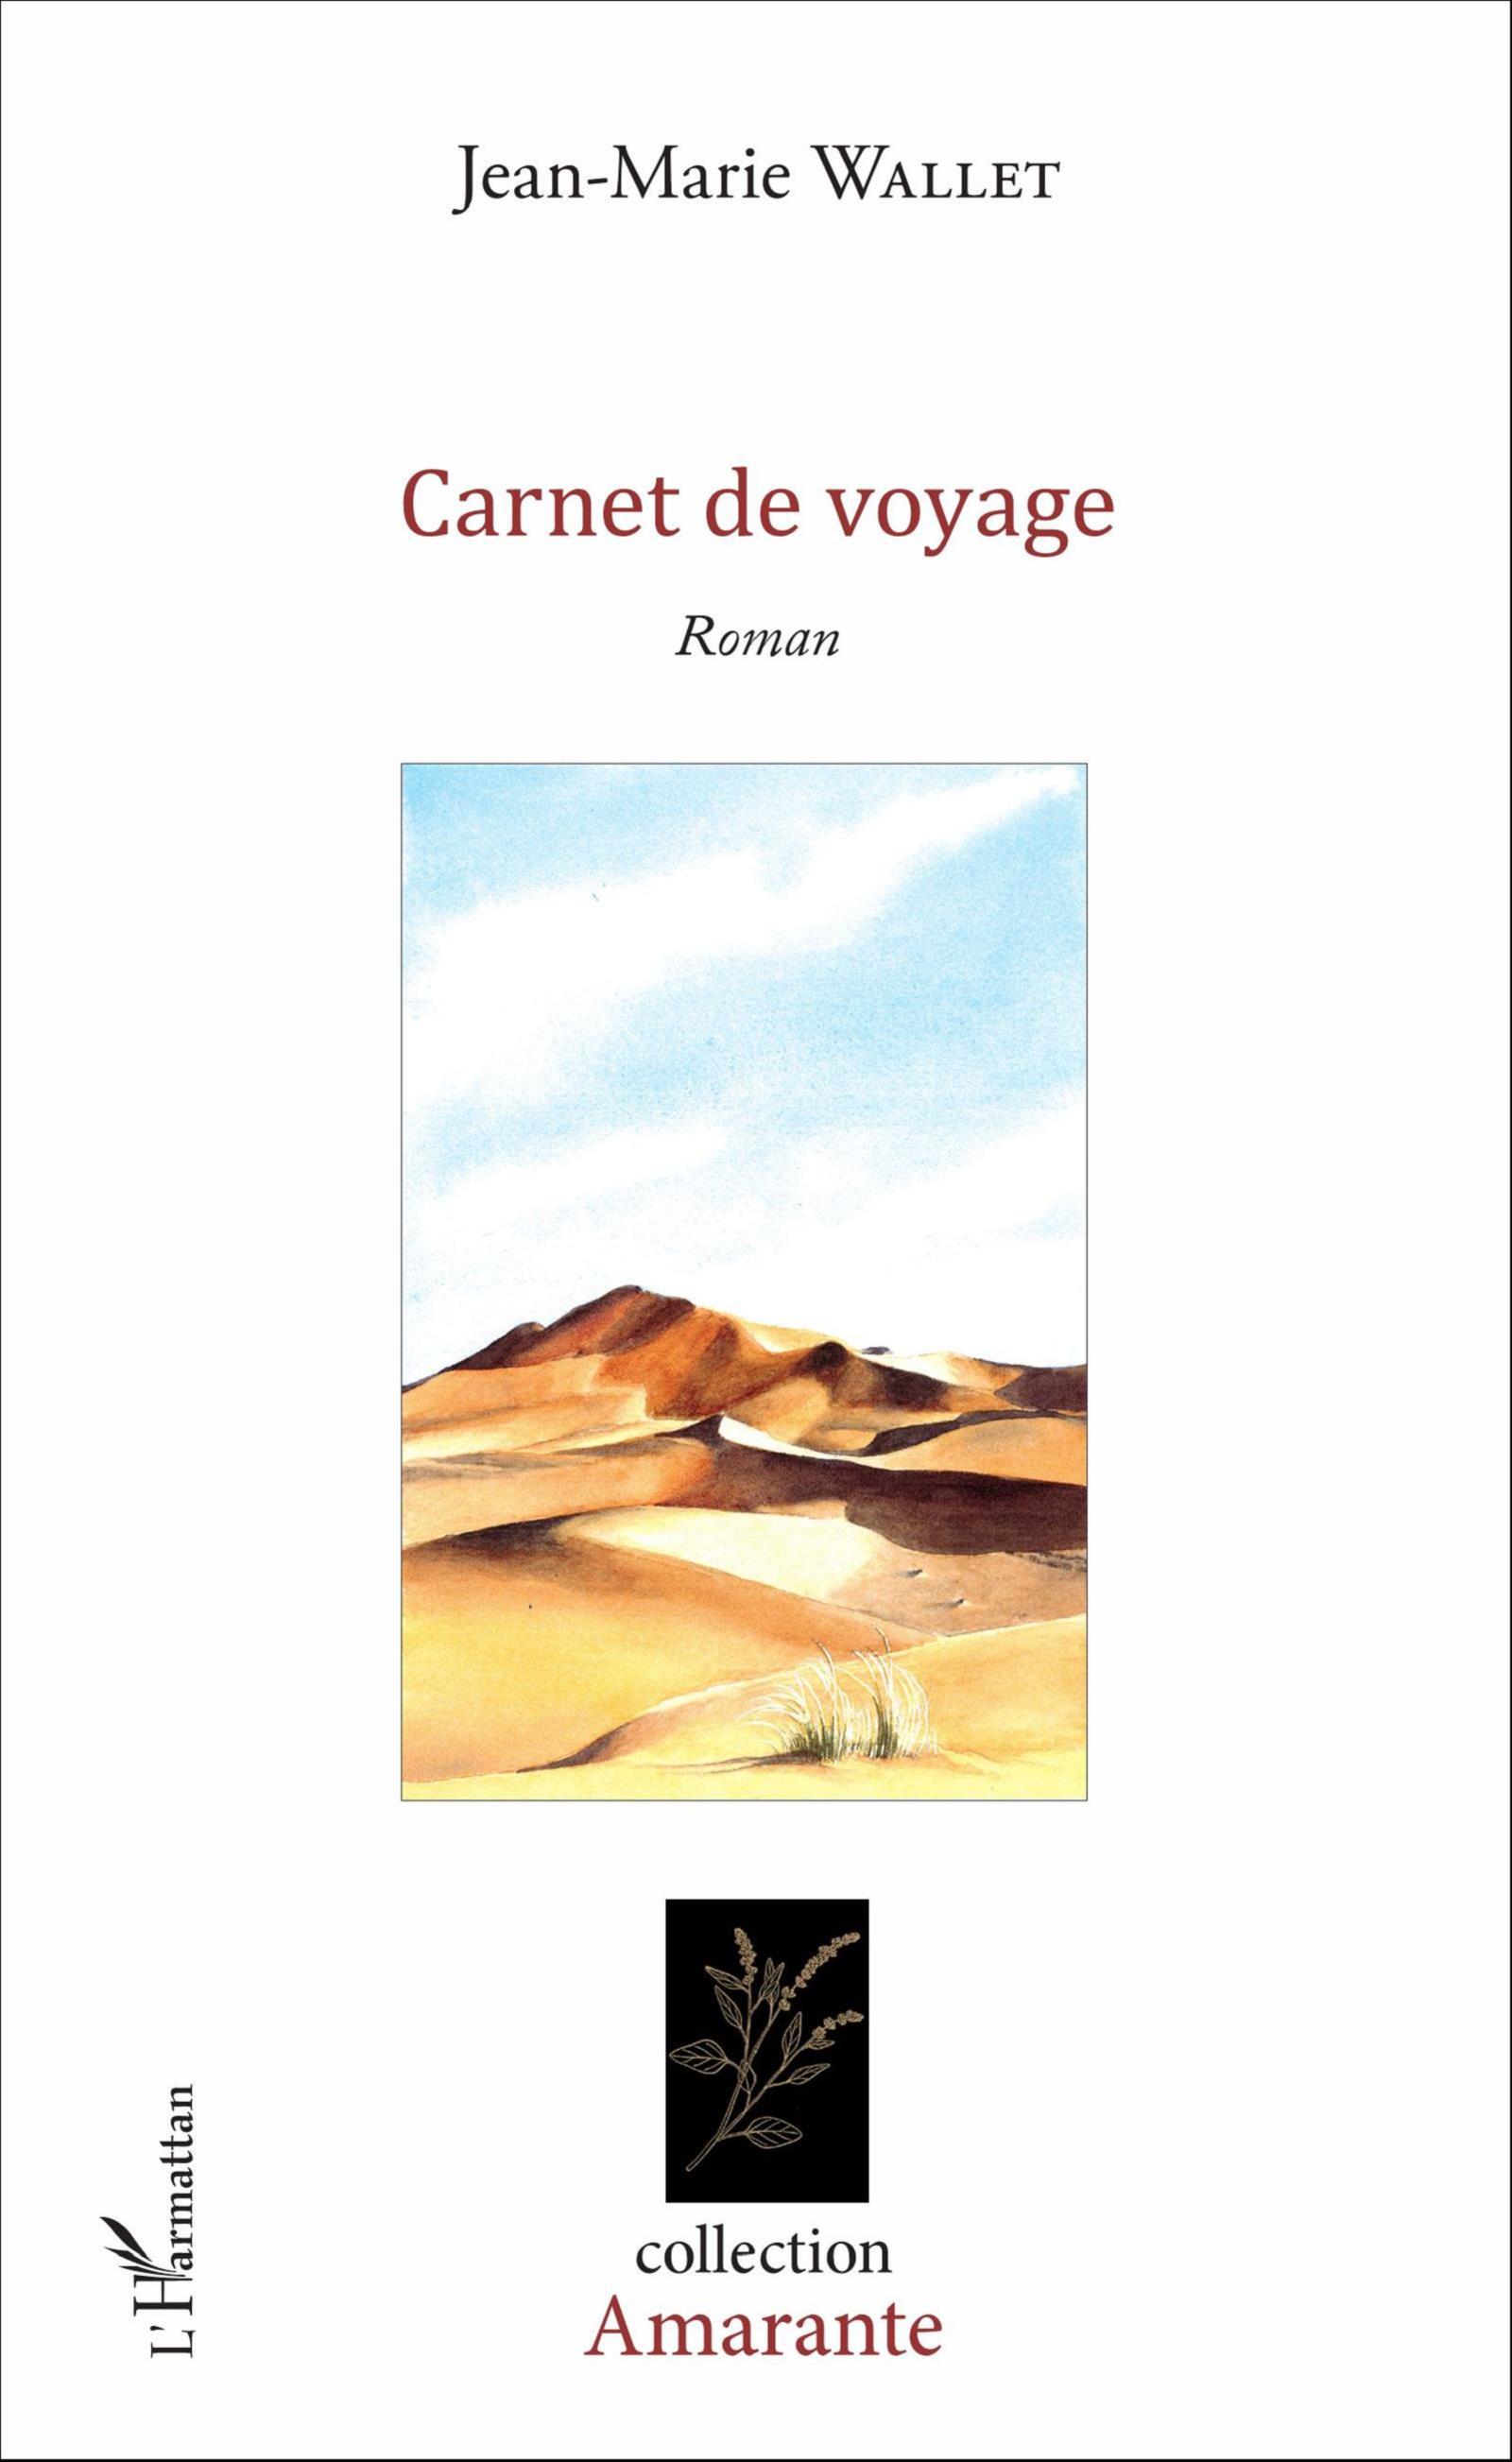 carnet de voyage roman jean marie wallet livre ebook epub. Black Bedroom Furniture Sets. Home Design Ideas